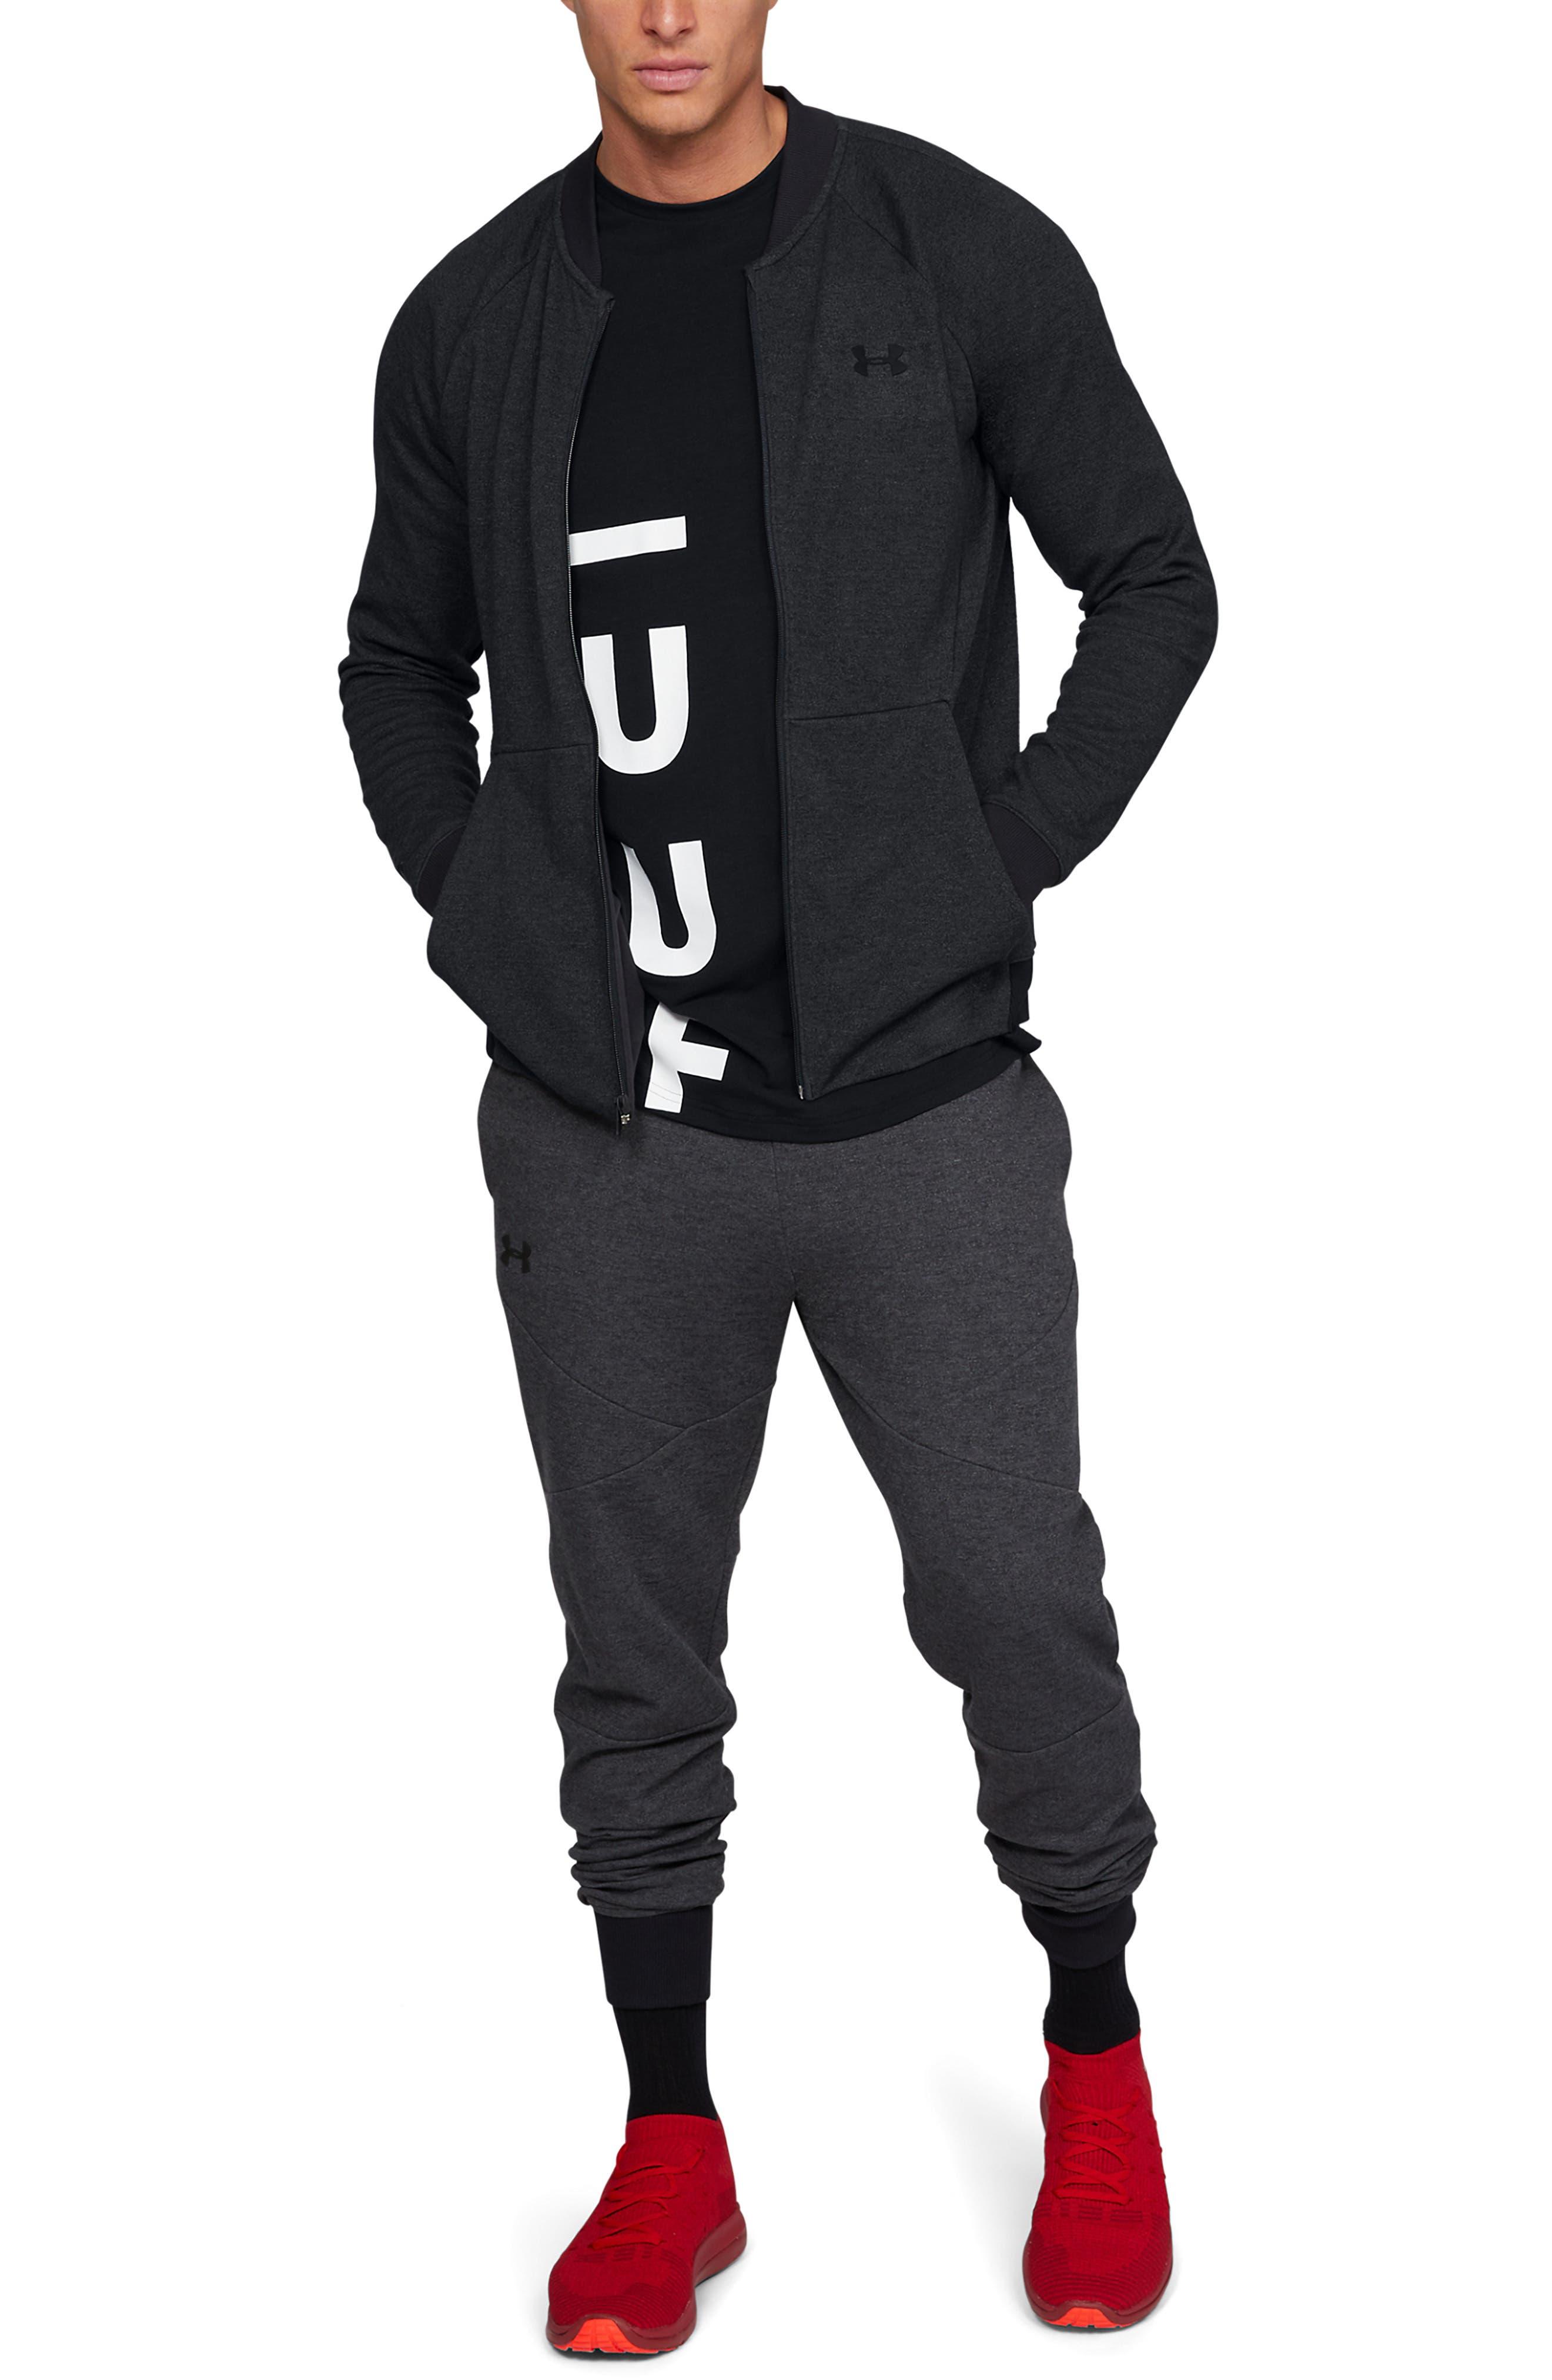 UNDER ARMOUR, Unstoppable Double Knit Bomber Jacket, Alternate thumbnail 6, color, BLACK/ BLACK/ BLACK